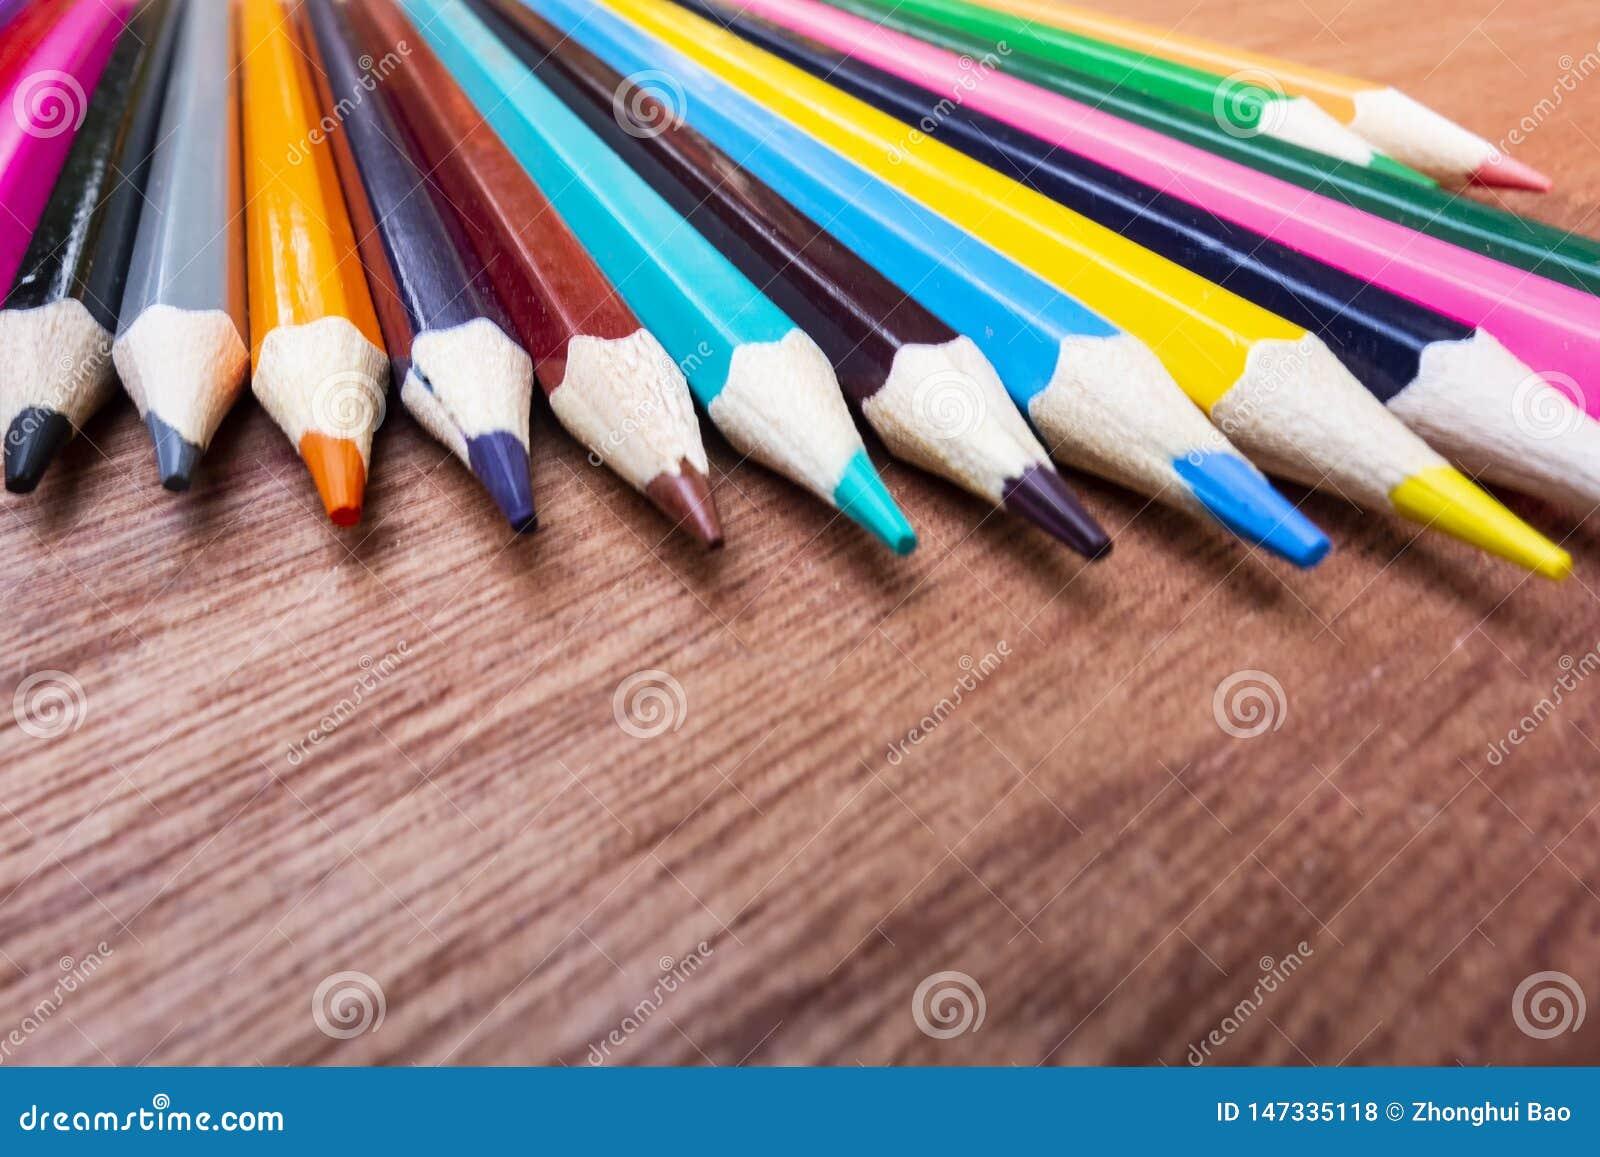 Coloured pencils arranged neatly